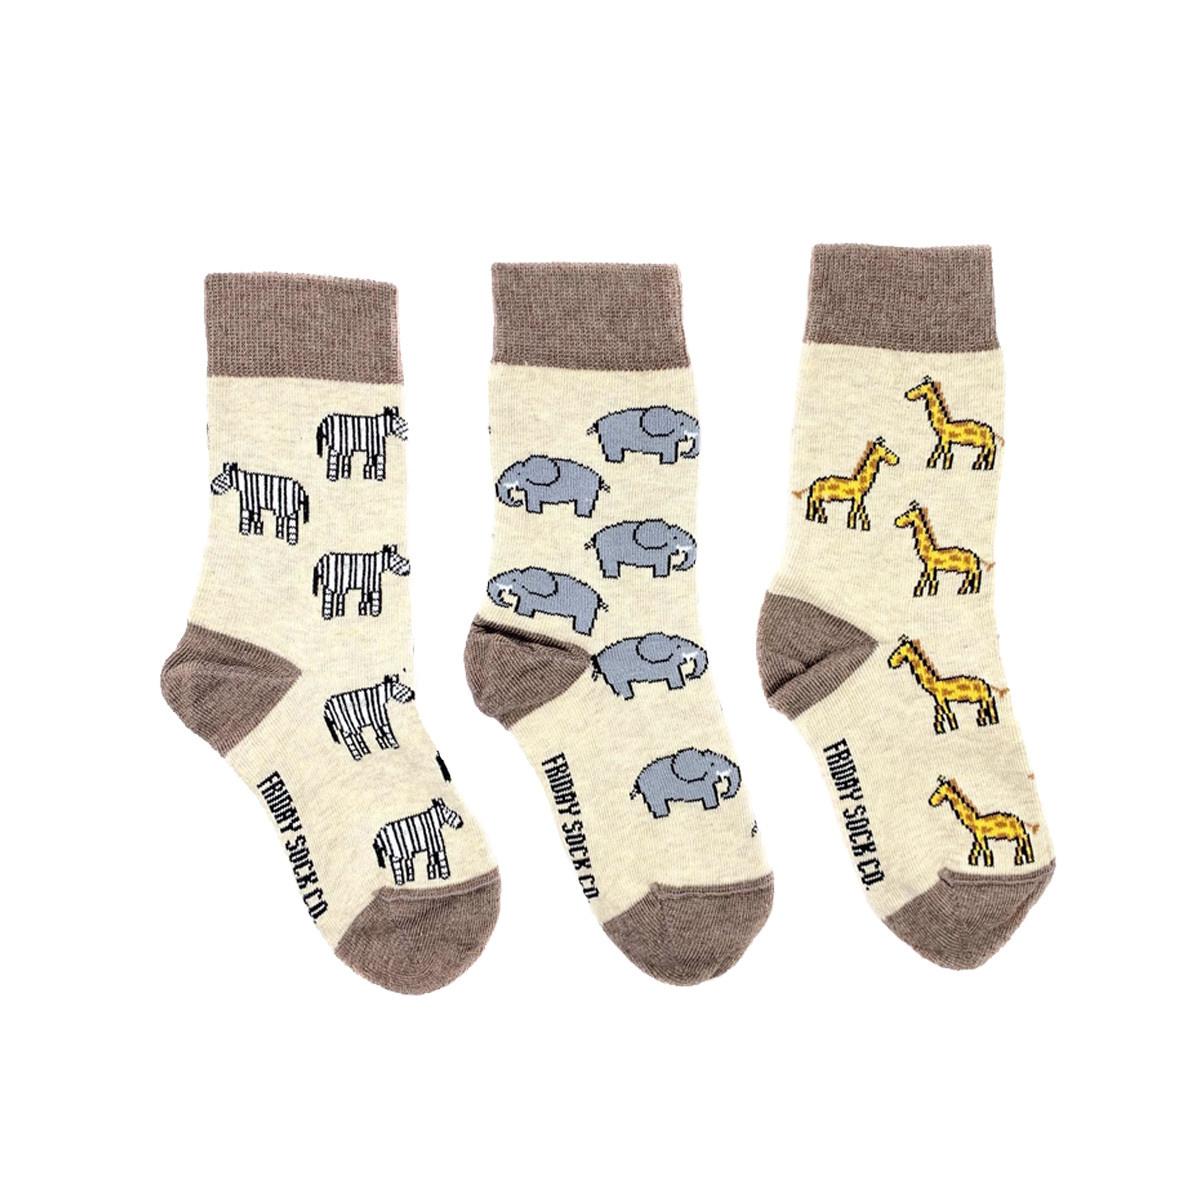 Friday Sock Co. Friday Sock Co. Kids Safari Crew